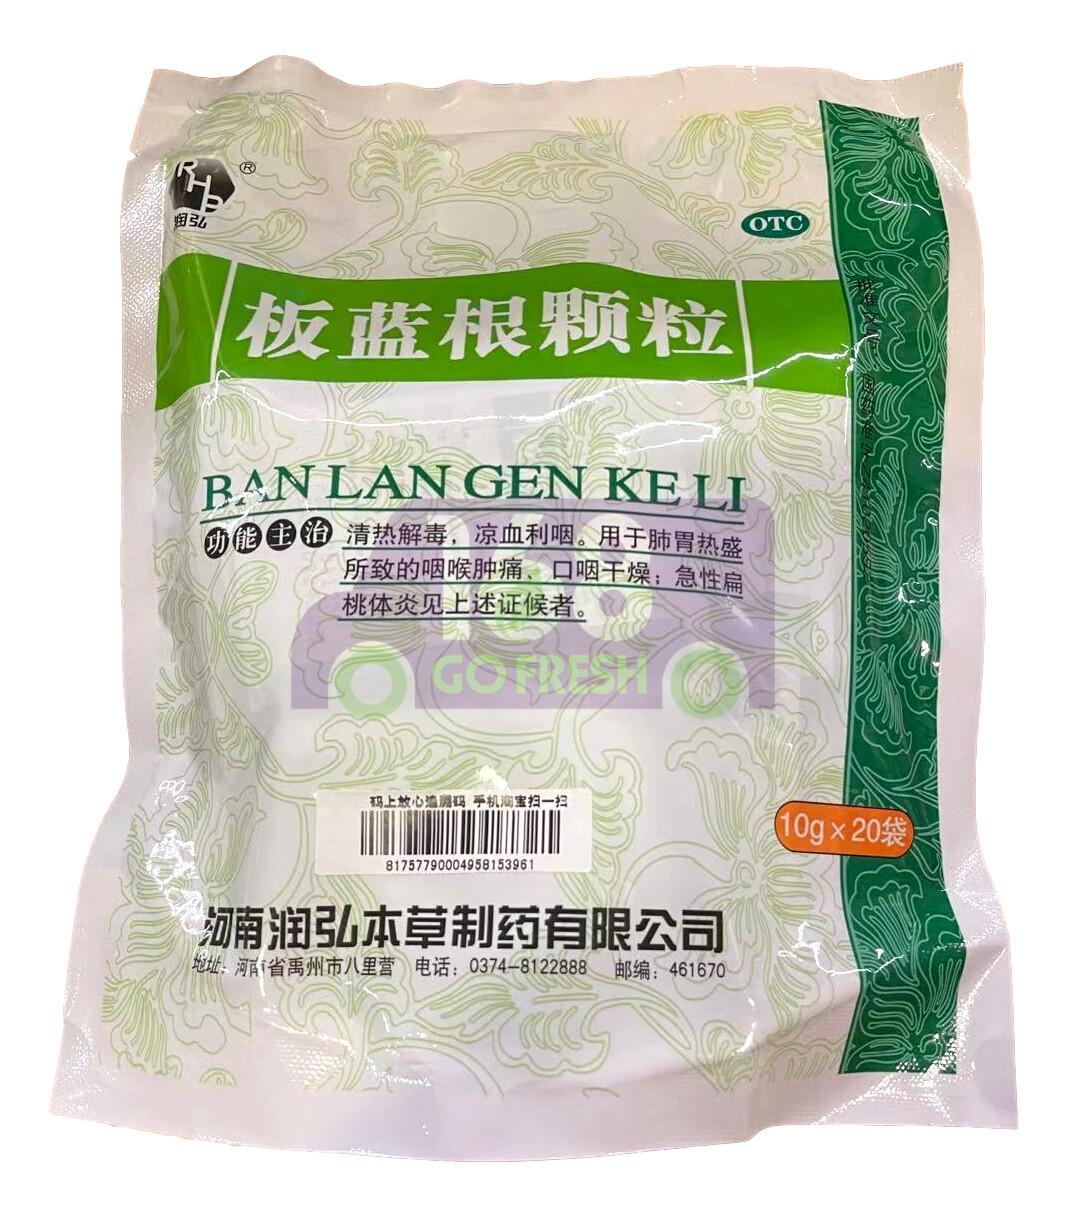 RUNHONG (Ban Lan Gen) Radix Isatidis Granules 10g*20sachets润弘板蓝根颗粒冲剂10g*20袋